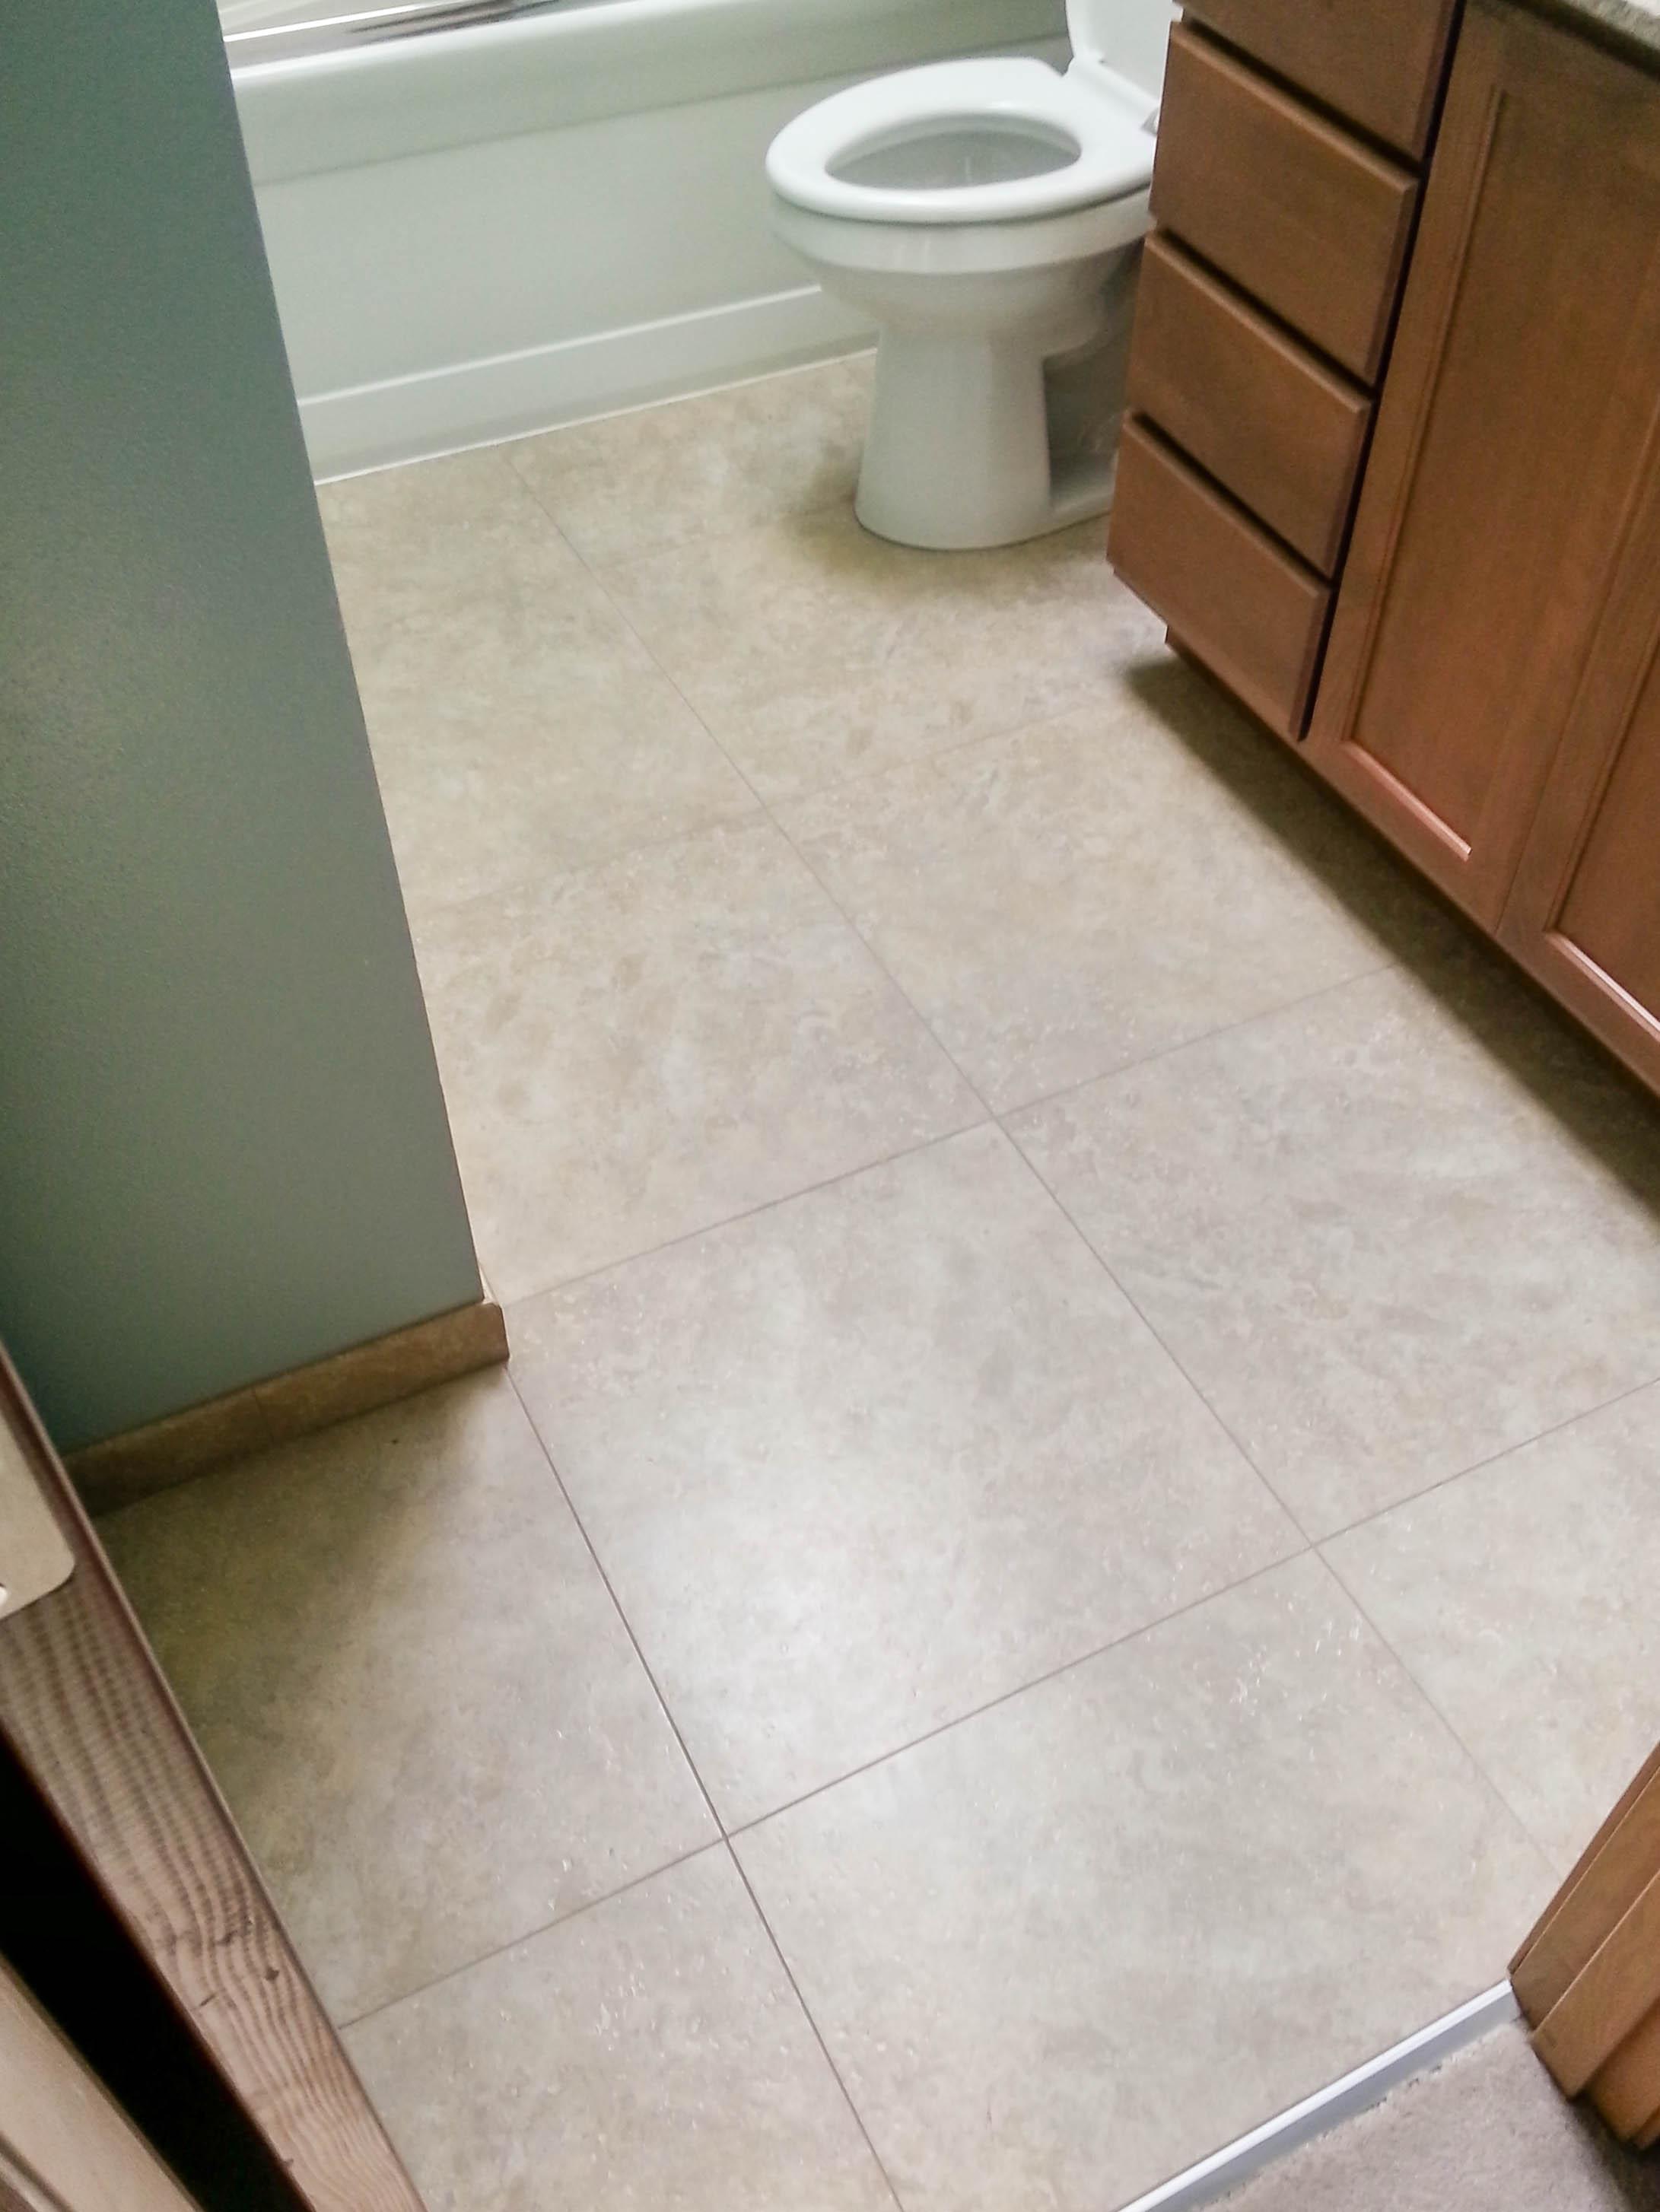 Bathroom floors seattle tile contractor irc tile services bathroom floor2 dailygadgetfo Images